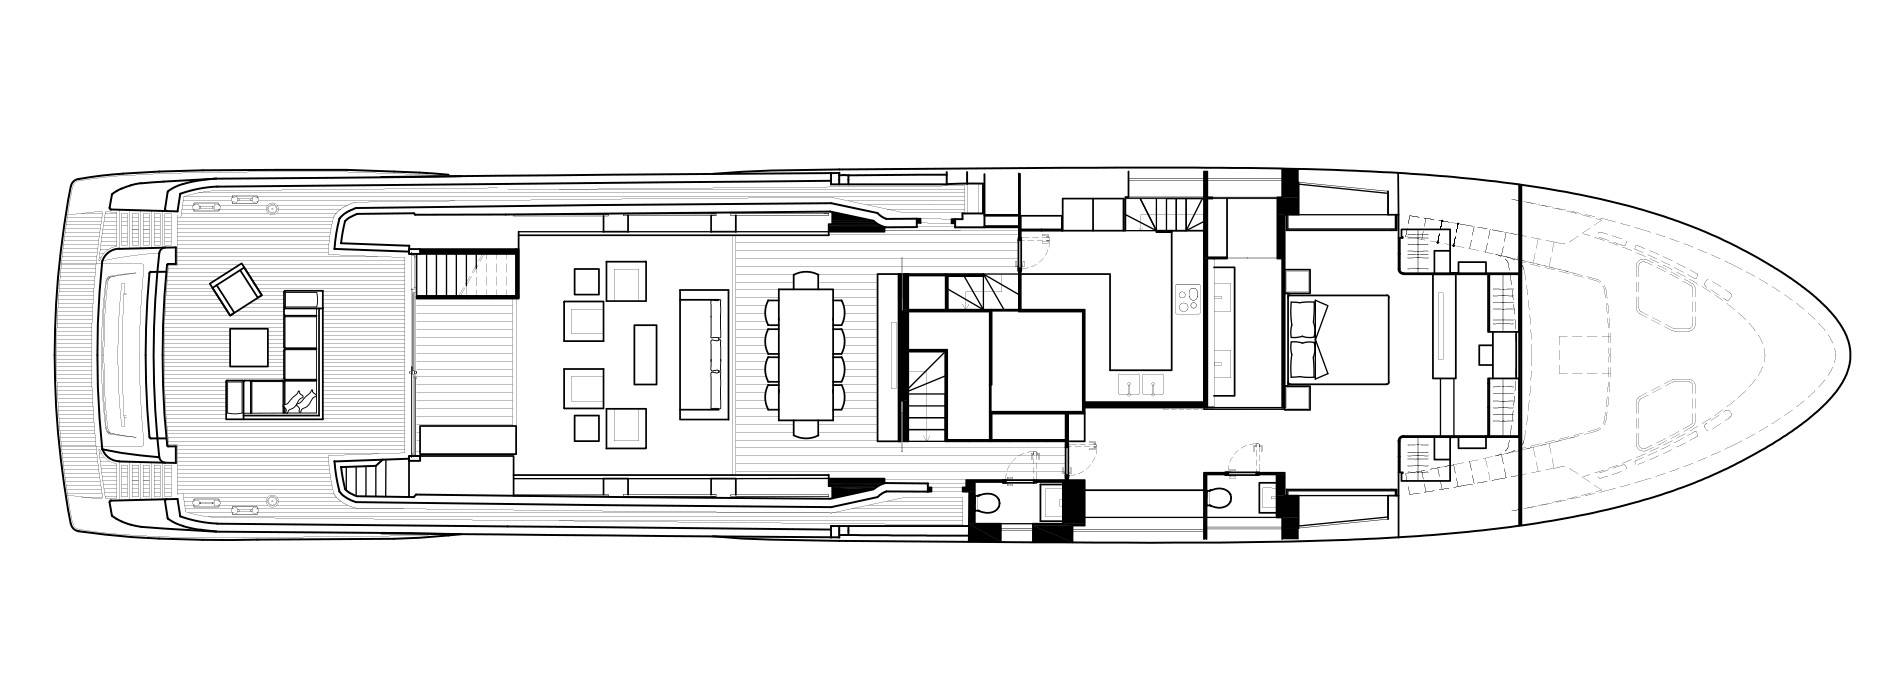 Sanlorenzo Yachts SL118 Main deck